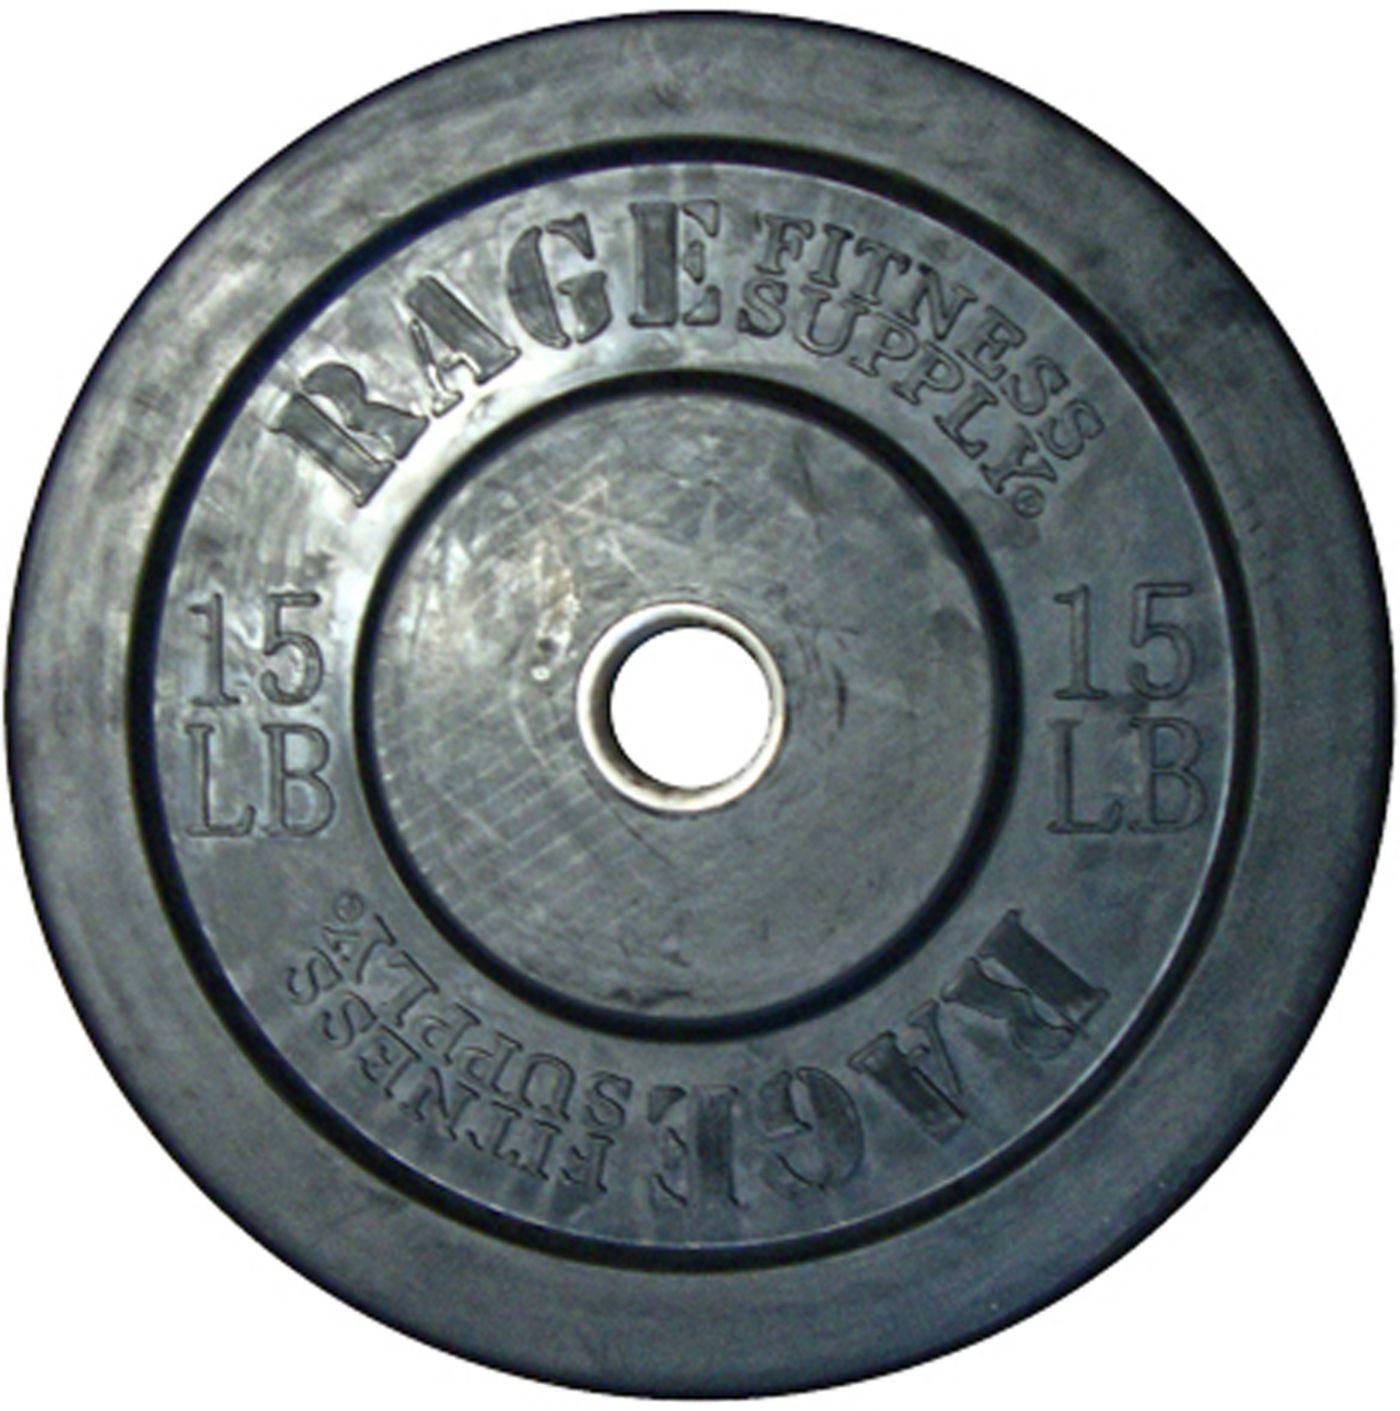 RAGE 15 lb Olympic Bumper Plate